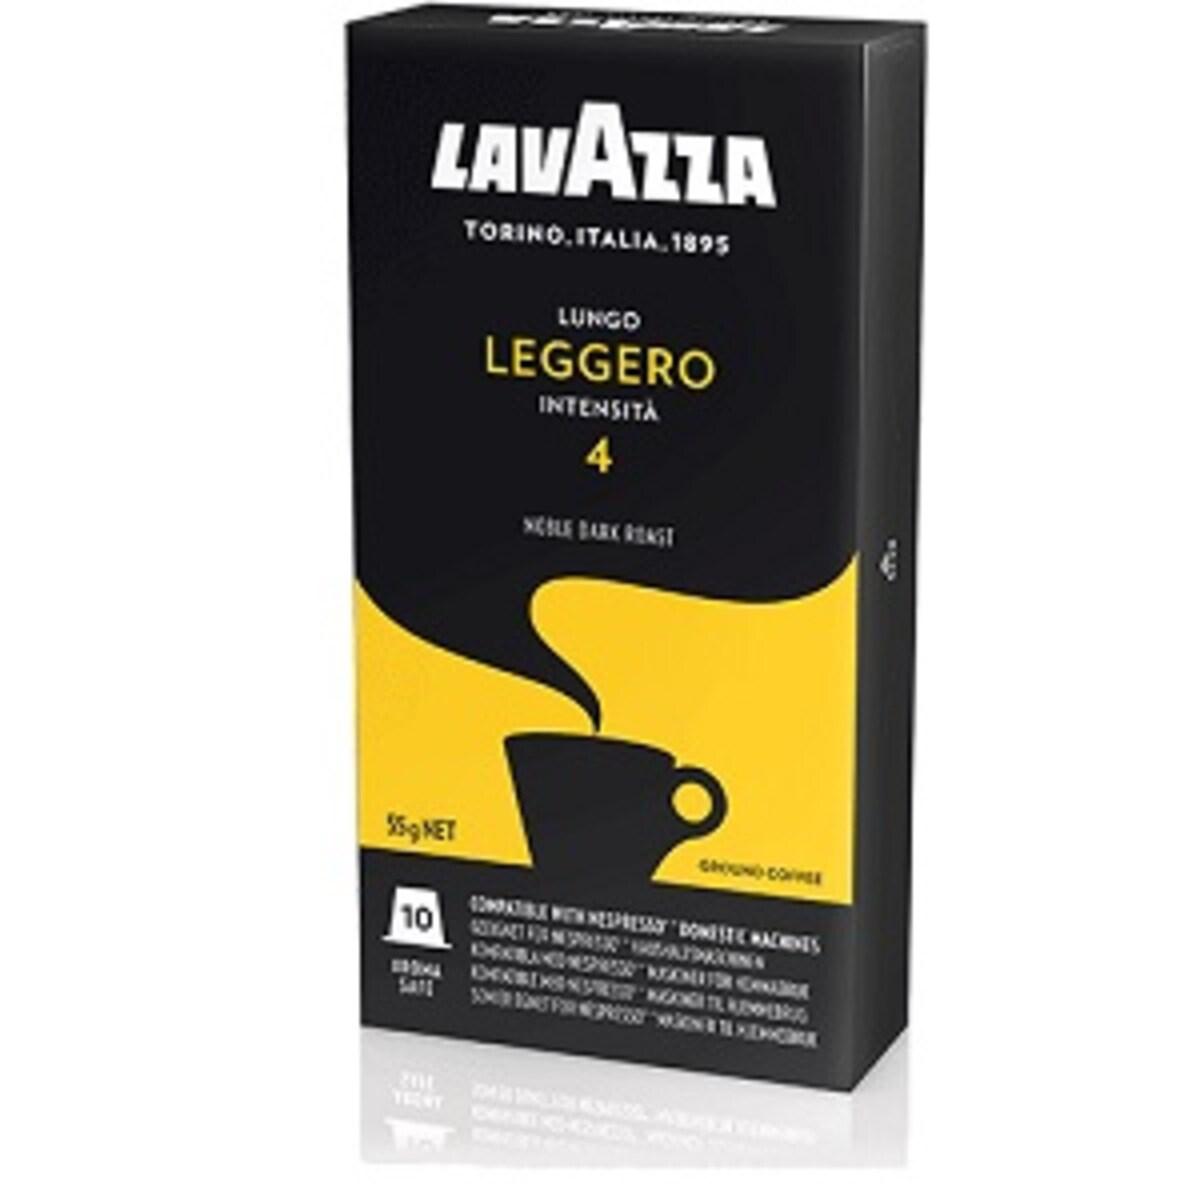 Lavazza Lungo Leggero Nespresso съвместими капсули 10бр